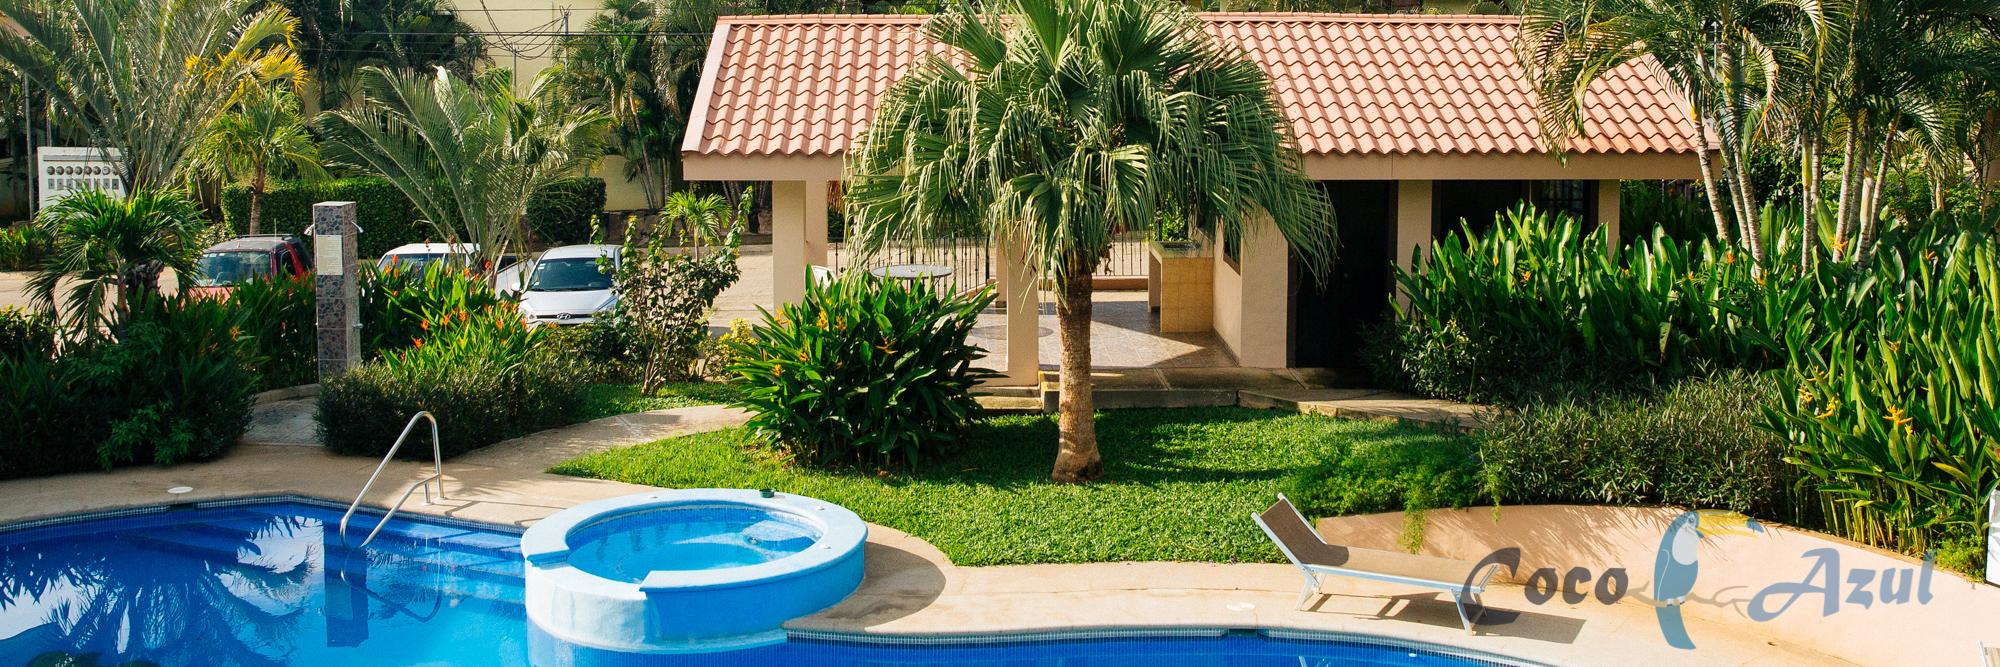 Apartment in Las Palmas Green Turtle 7